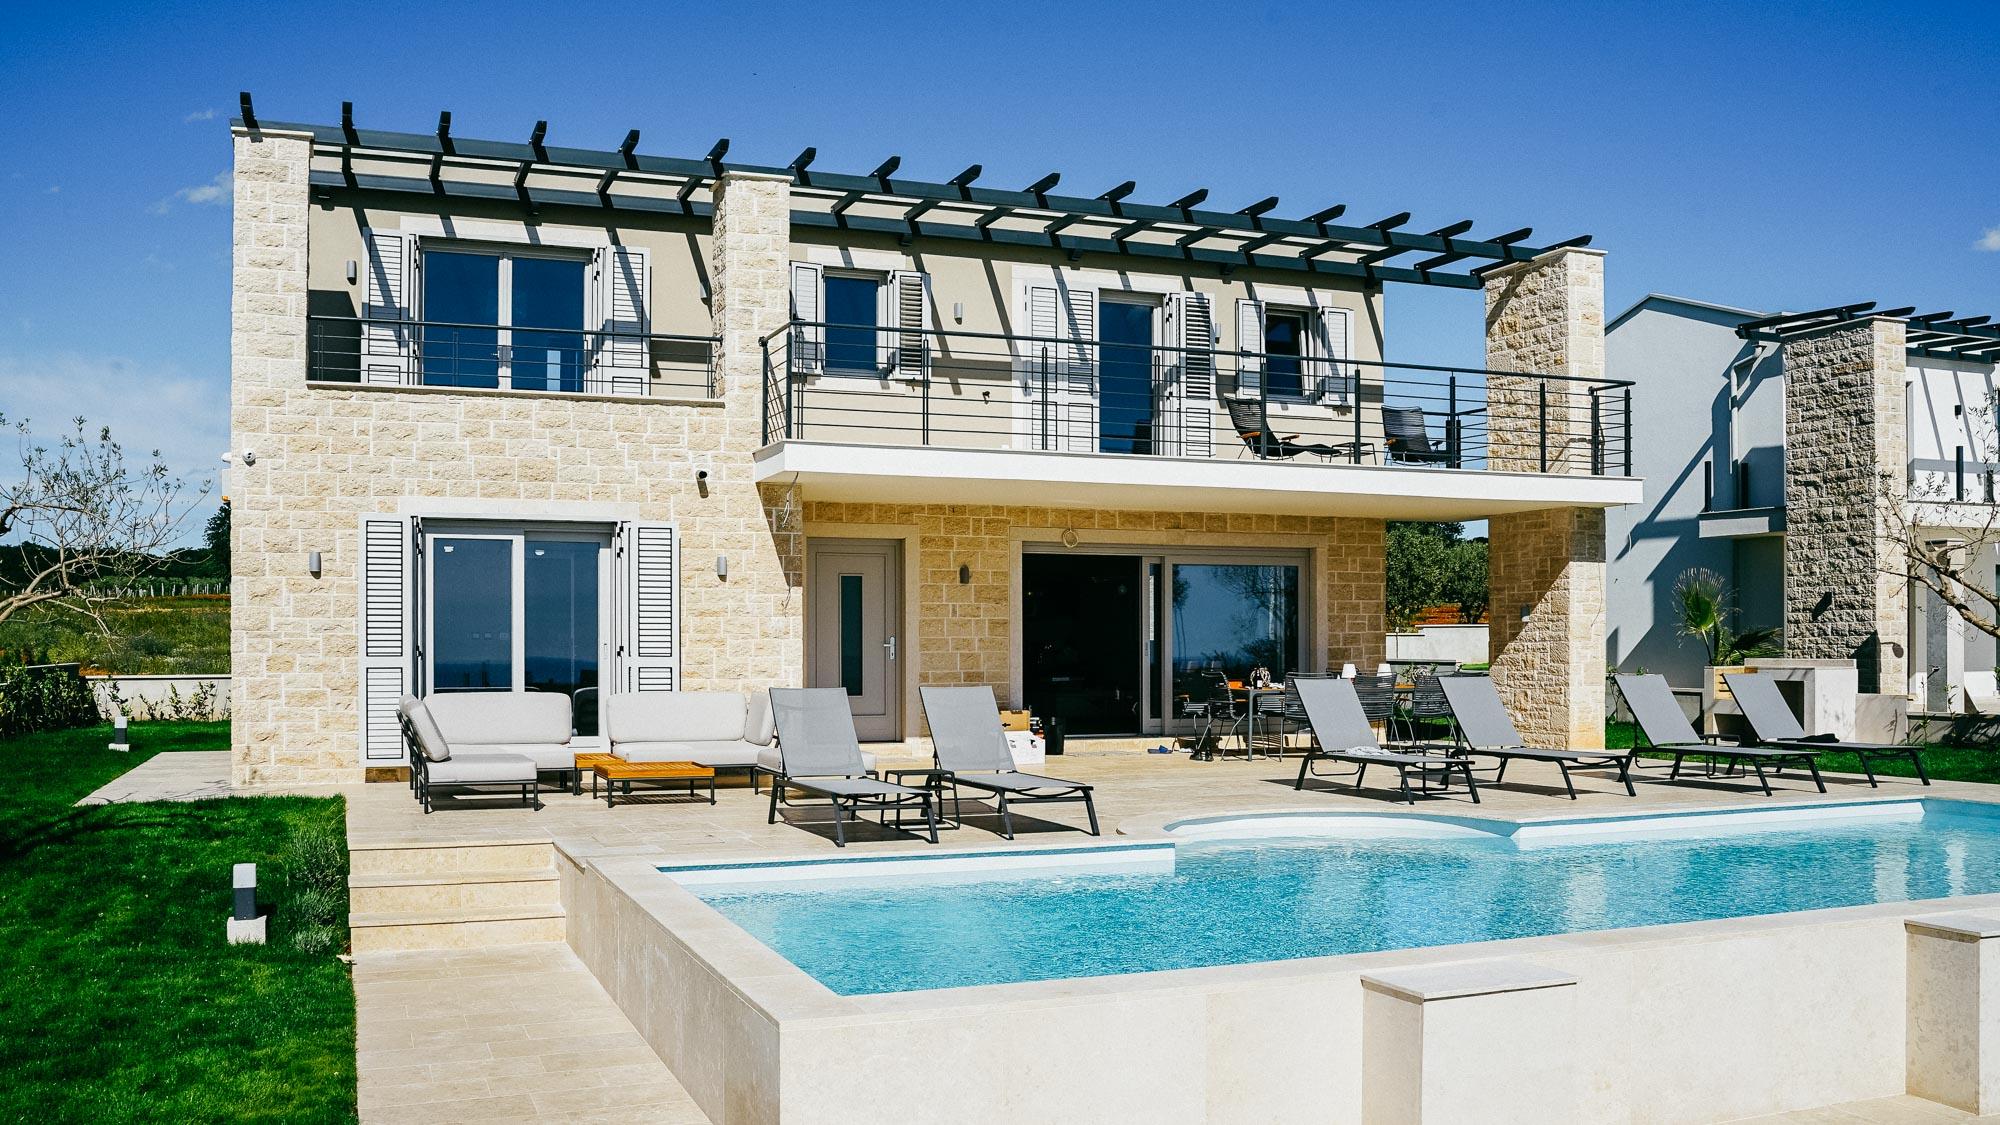 villa-flamingo-istrien-kroatien-yohome-lifestyle-vacation-slide-villa-4